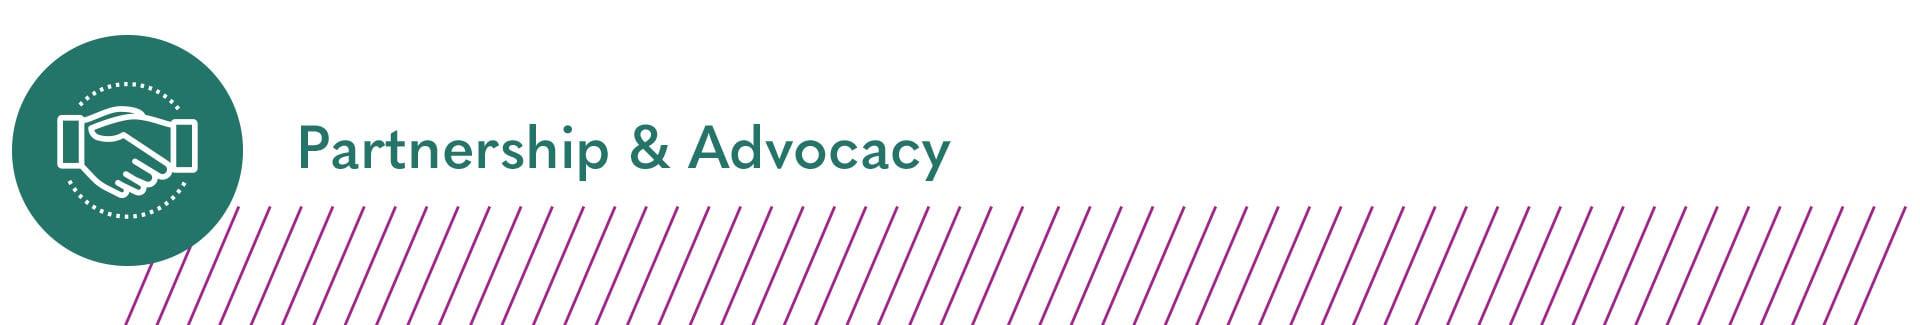 Partnership & Advocacy